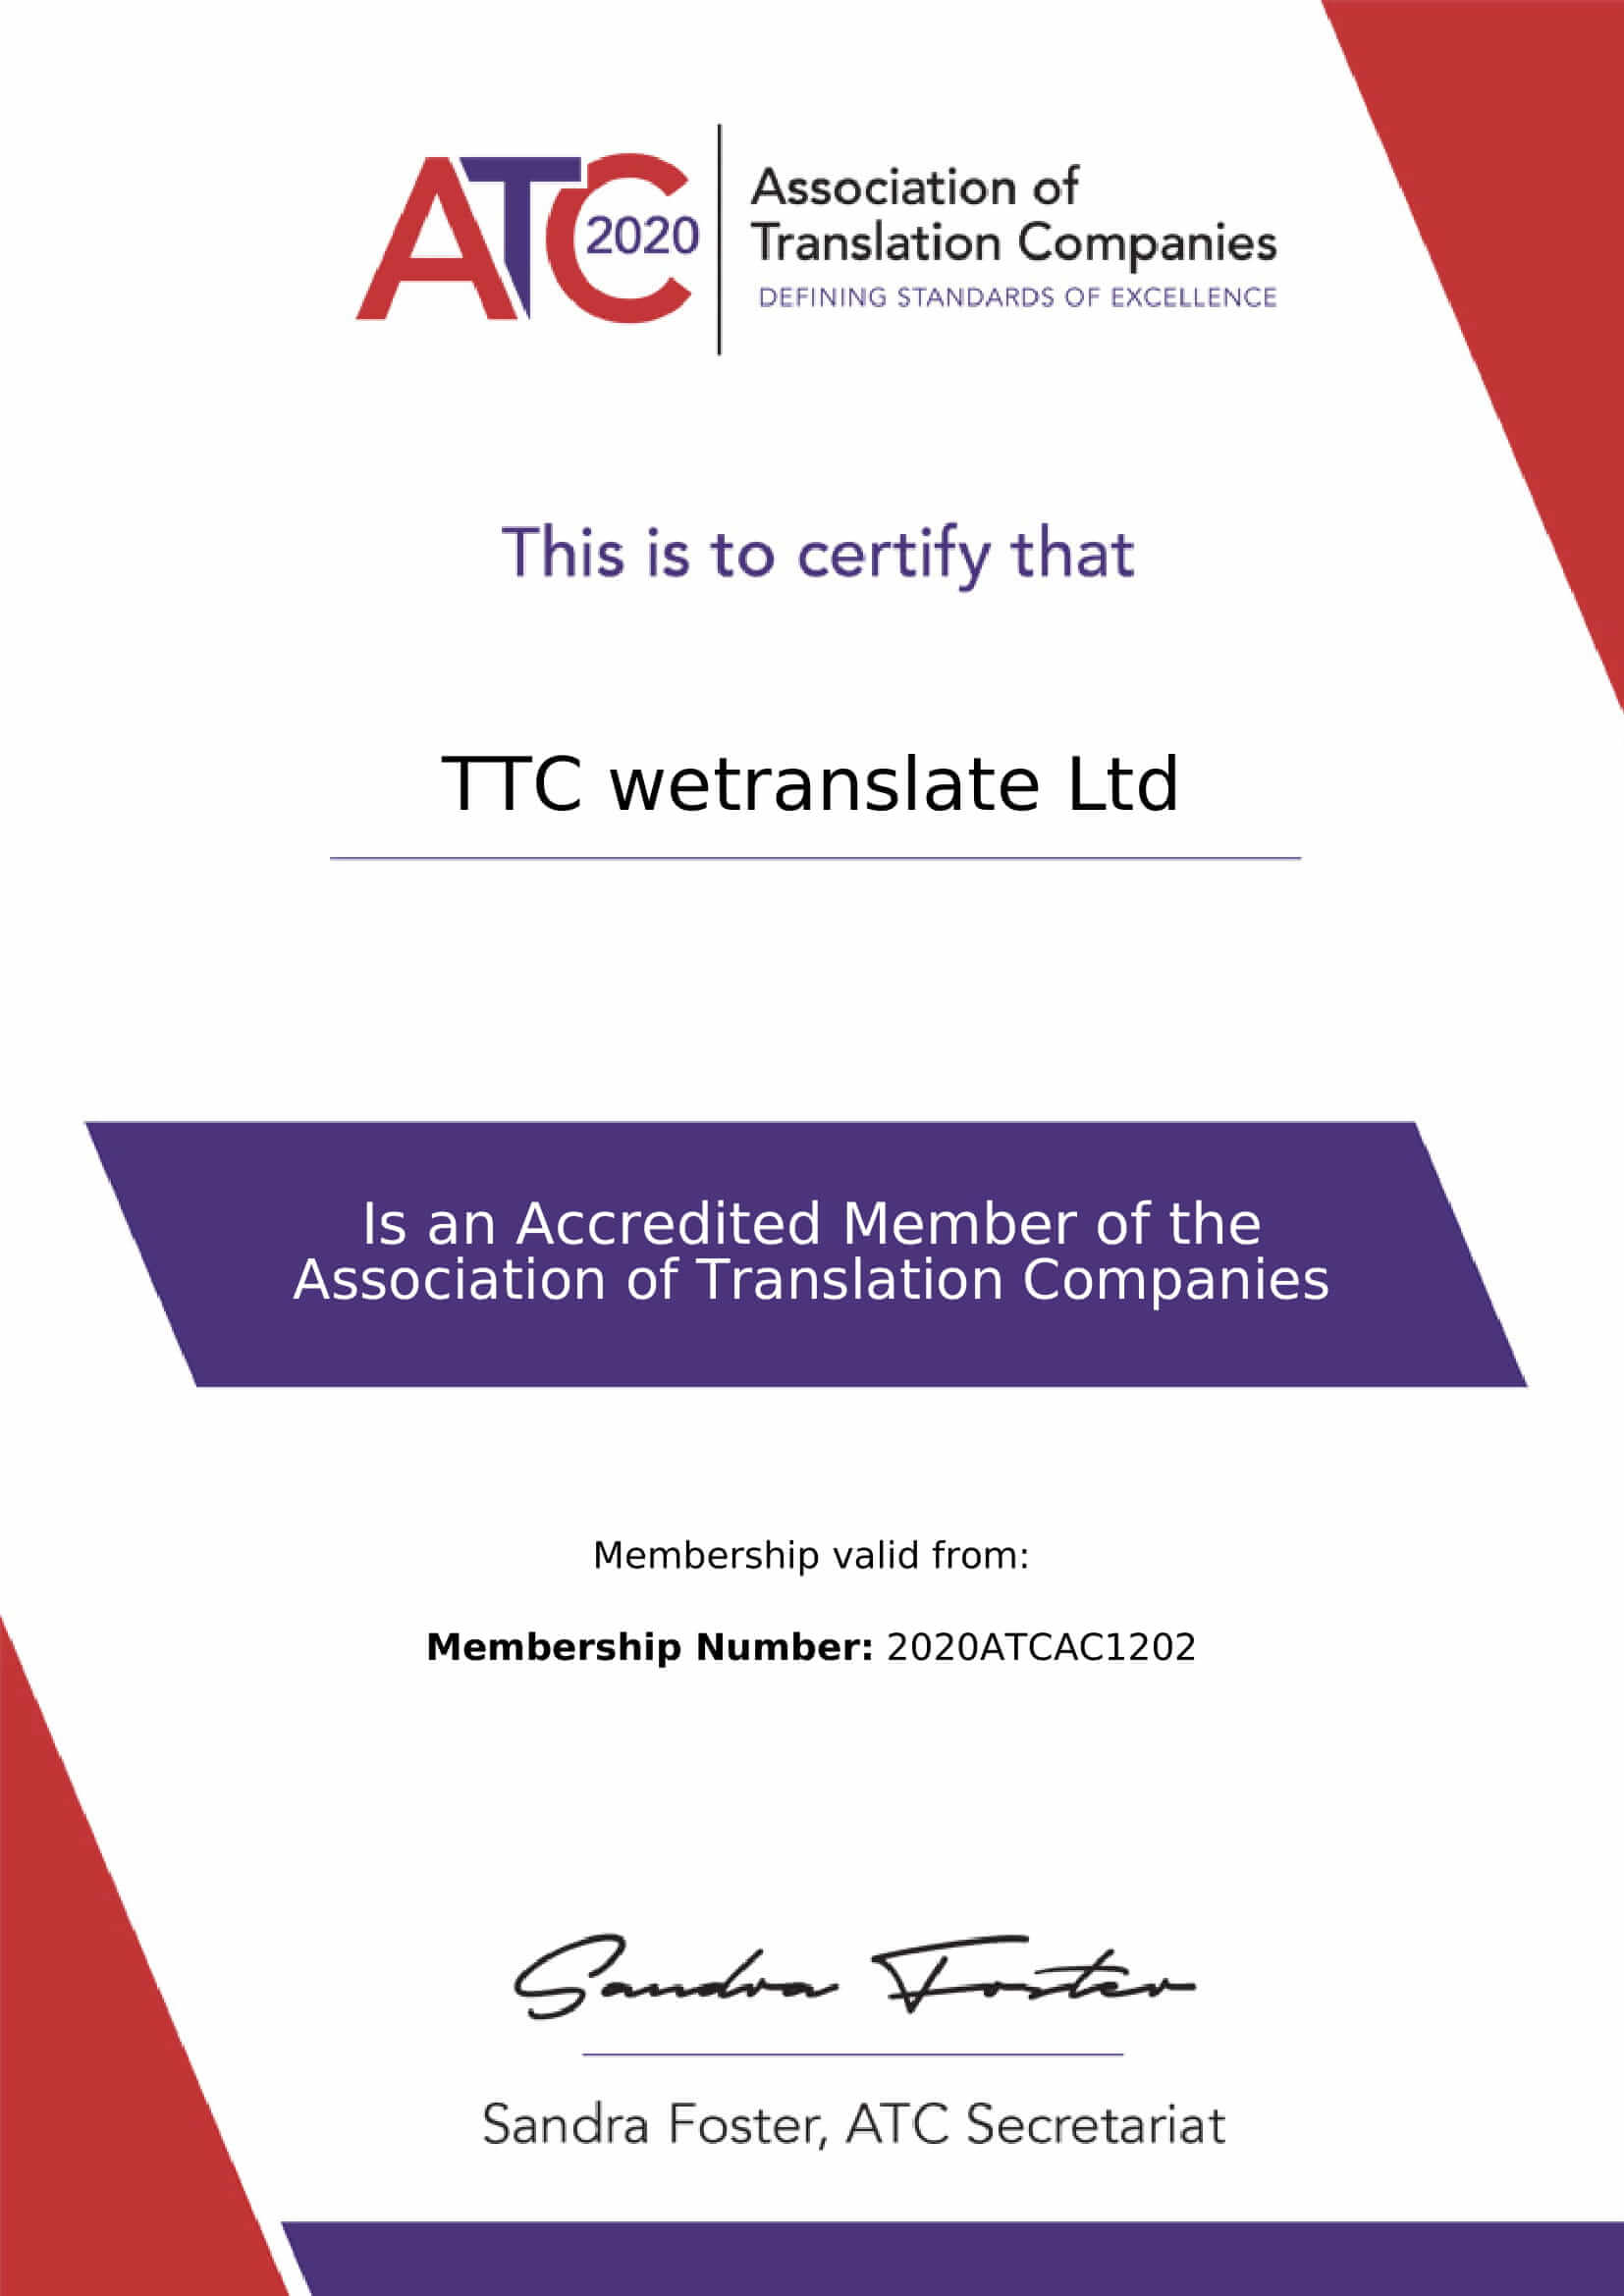 TTC wetranslate ATC Membership Certificate